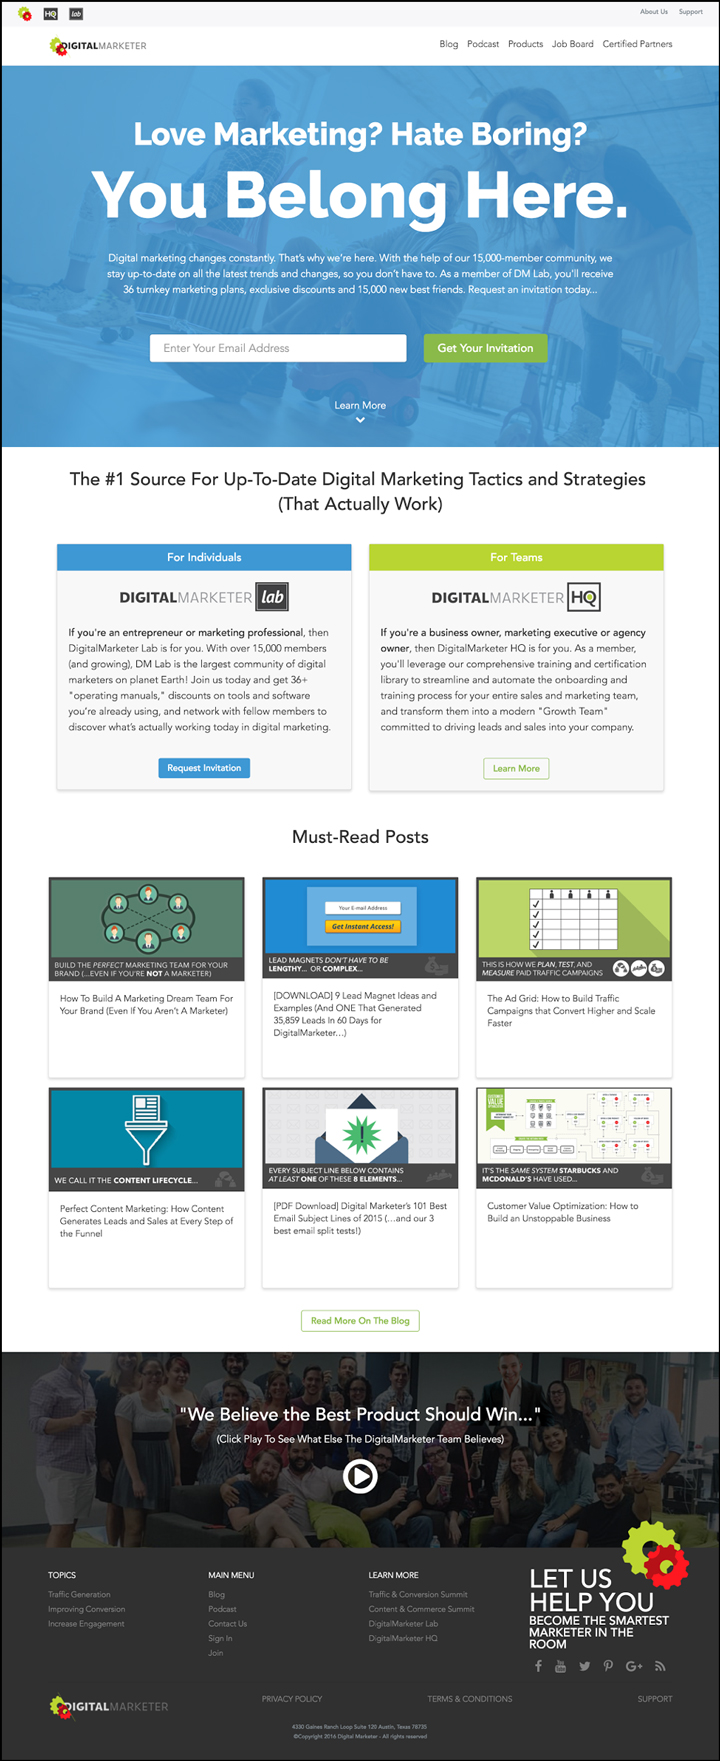 The DigitalMarketer homepage